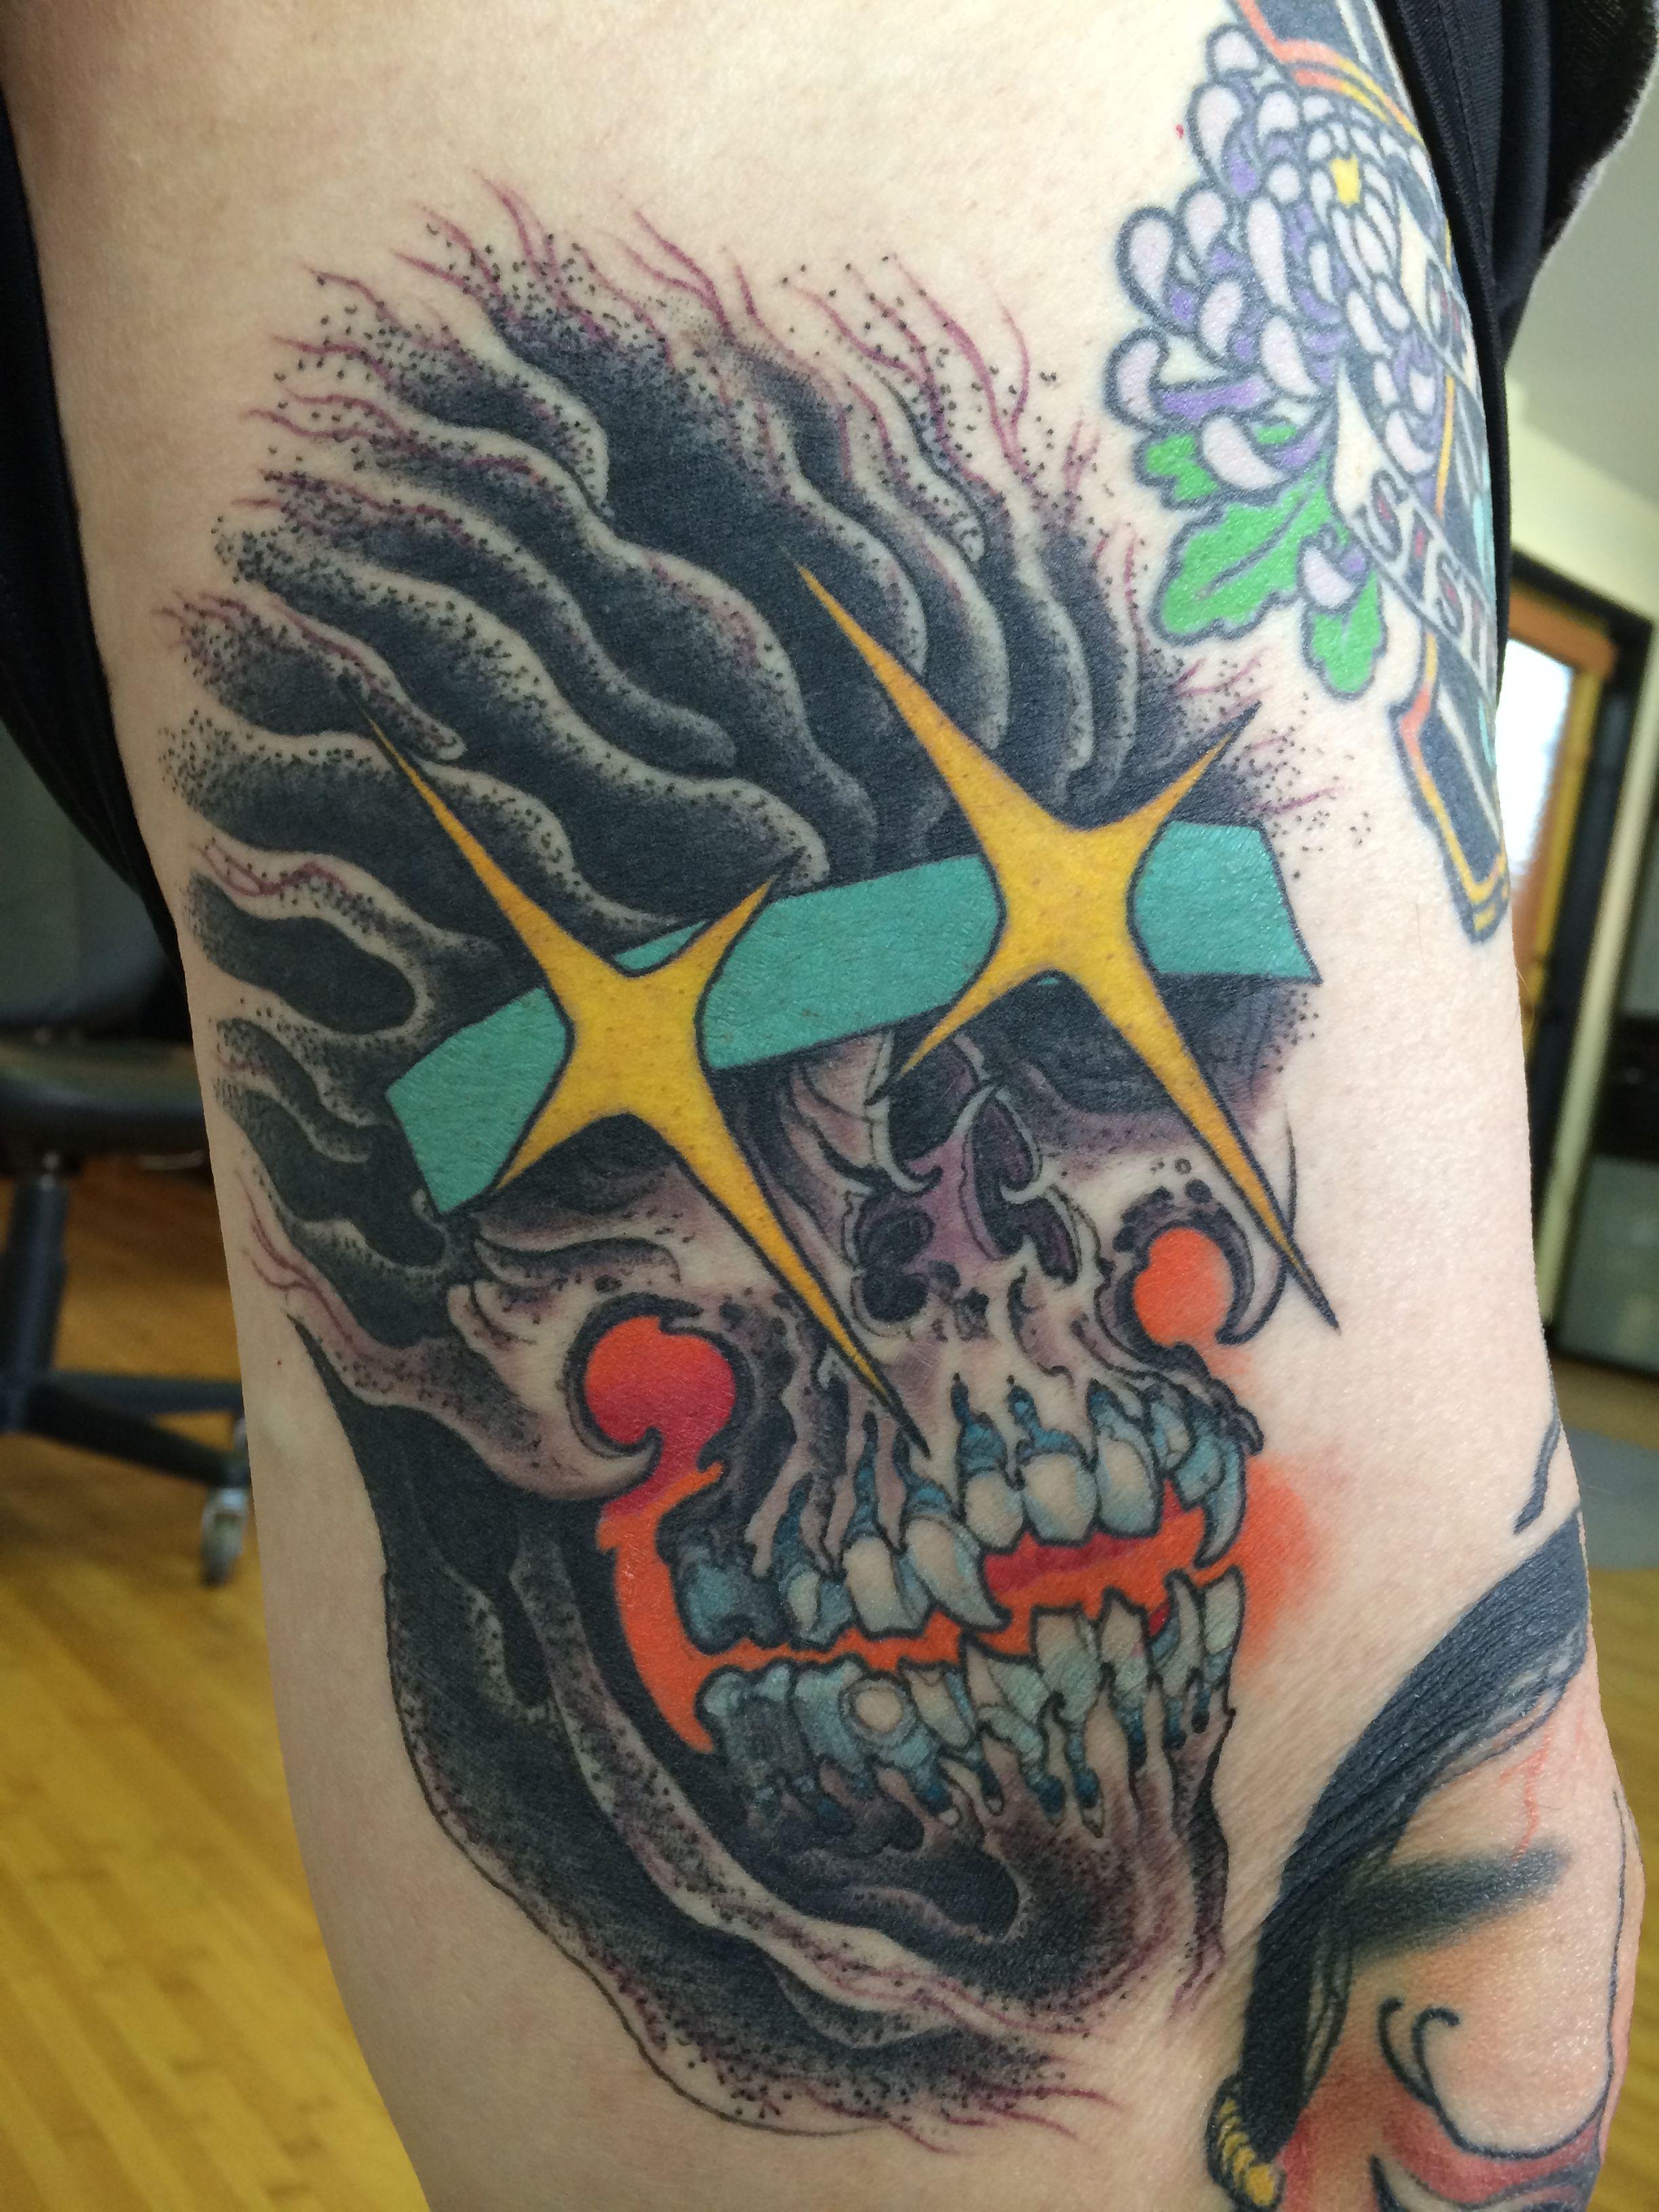 Grime Tattoo Artist >> grime tattoo - Pesquisa Google | Tattoos | Pinterest ...